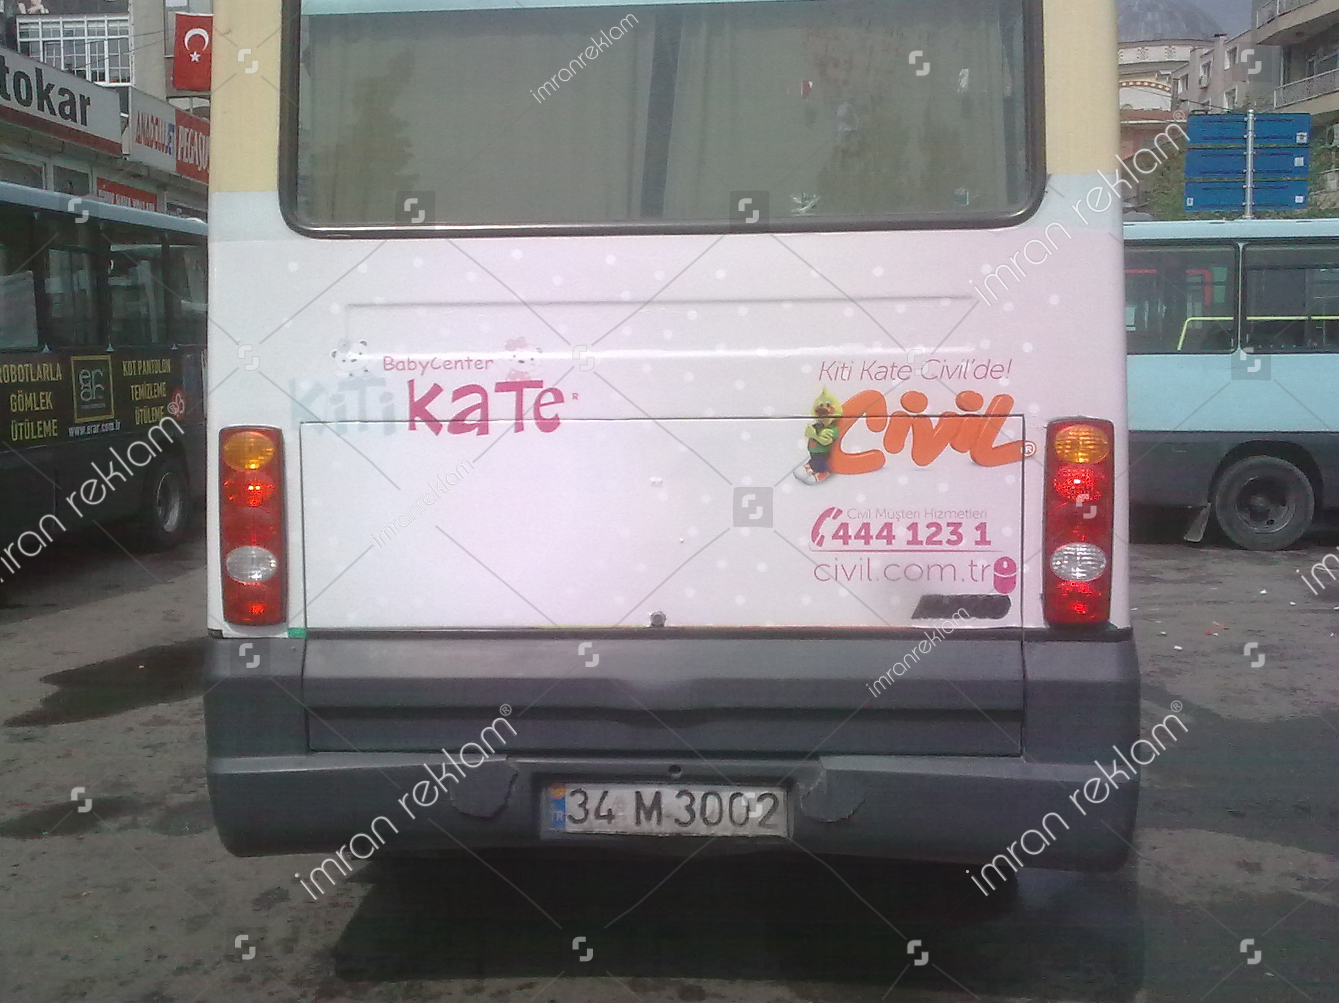 minibuse-reklam-kaplama